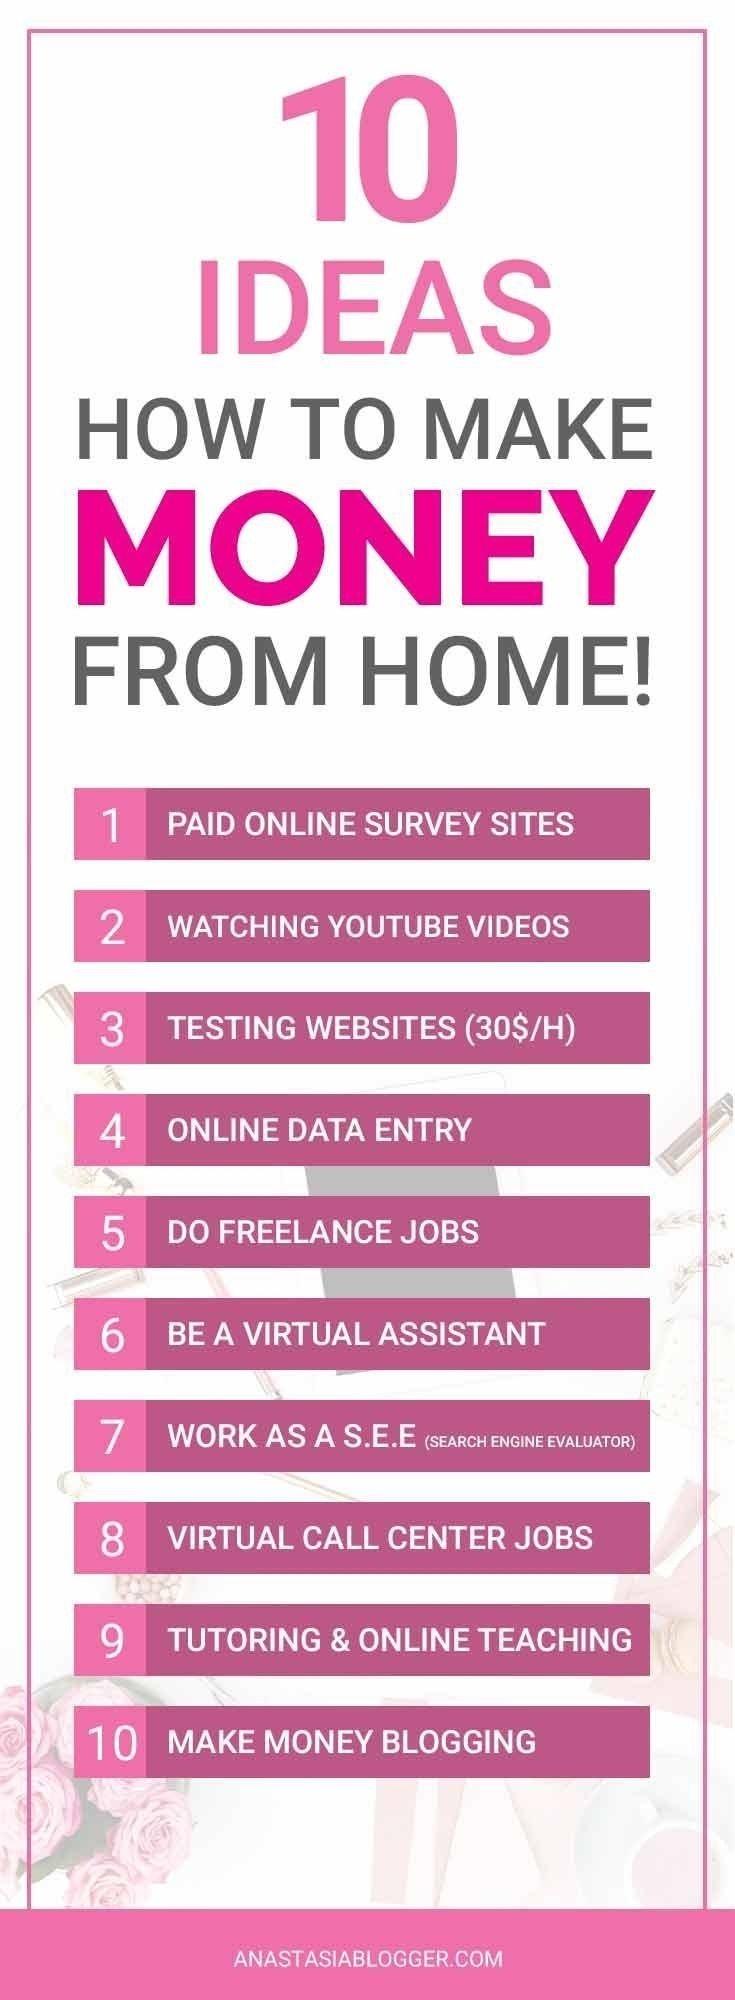 10 Beautiful Ideas How To Make Money 31662 best make money images on pinterest earn money online 1 2020